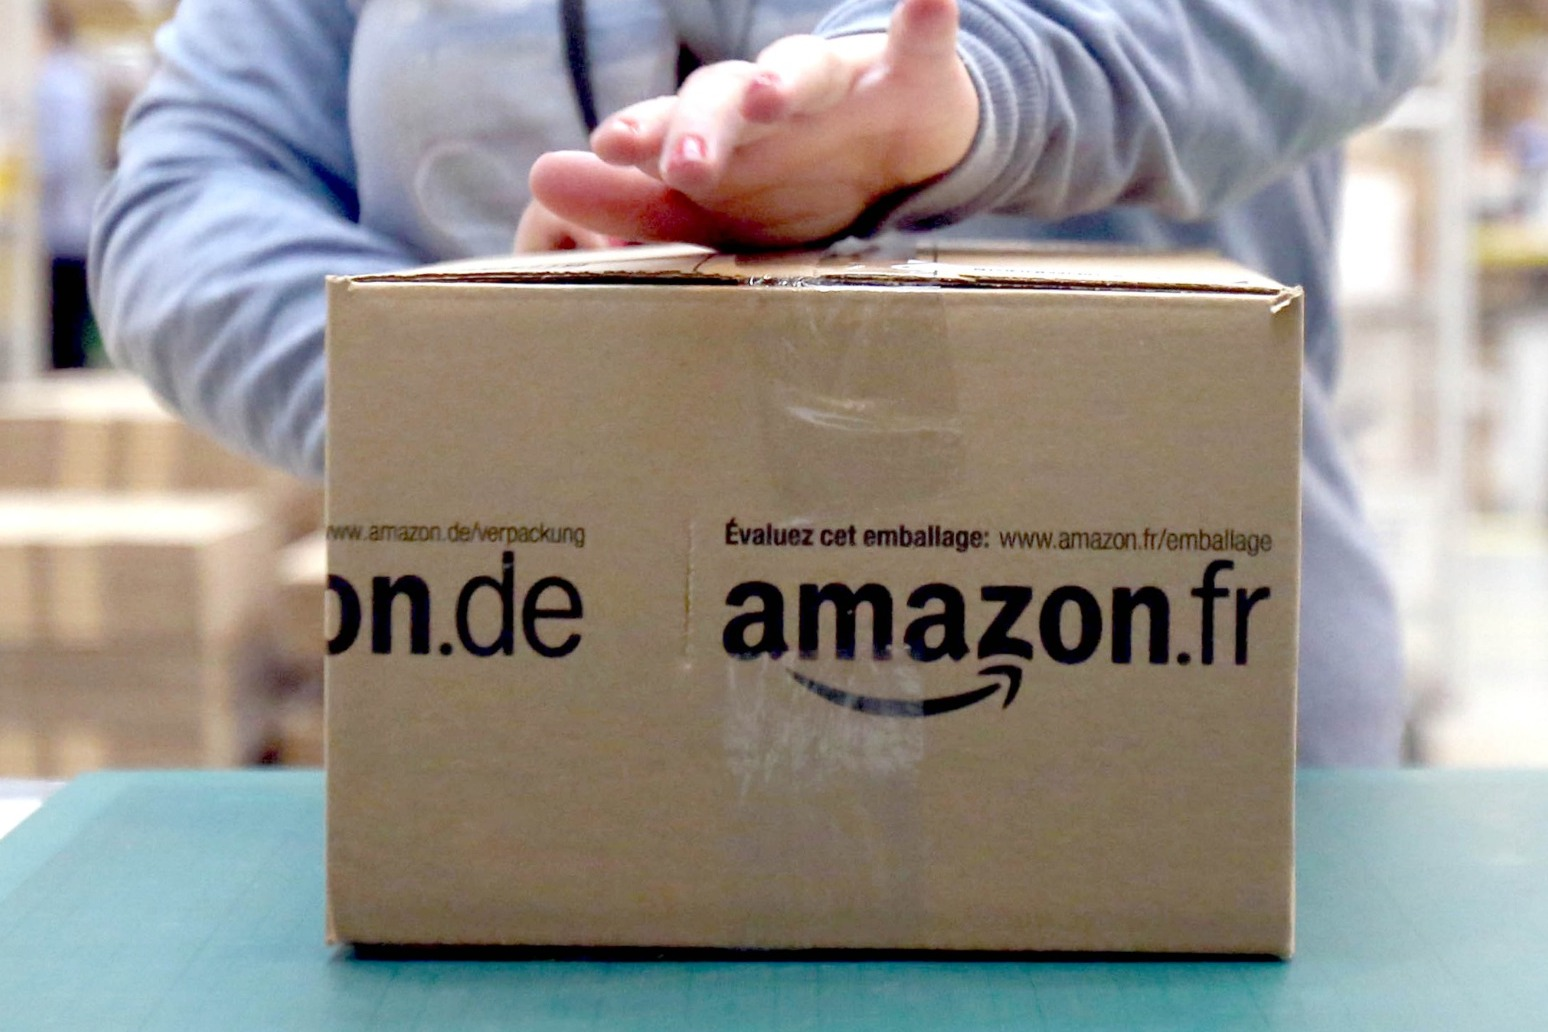 Amazon to introduce new technology into UK operations